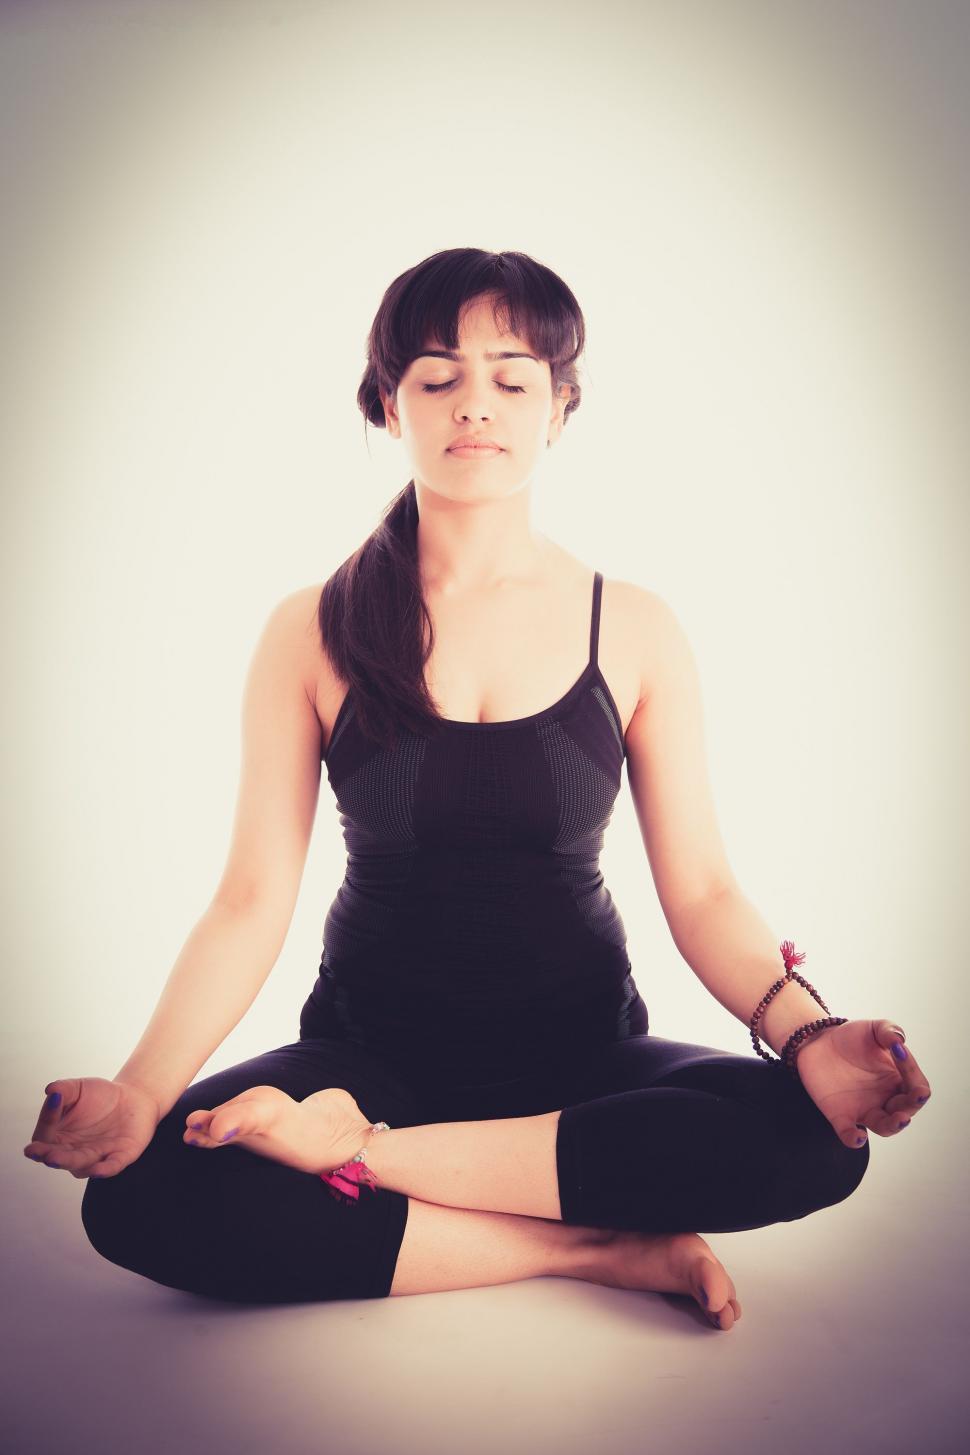 Download Free Stock Photo of Yoga Pose - Meditation